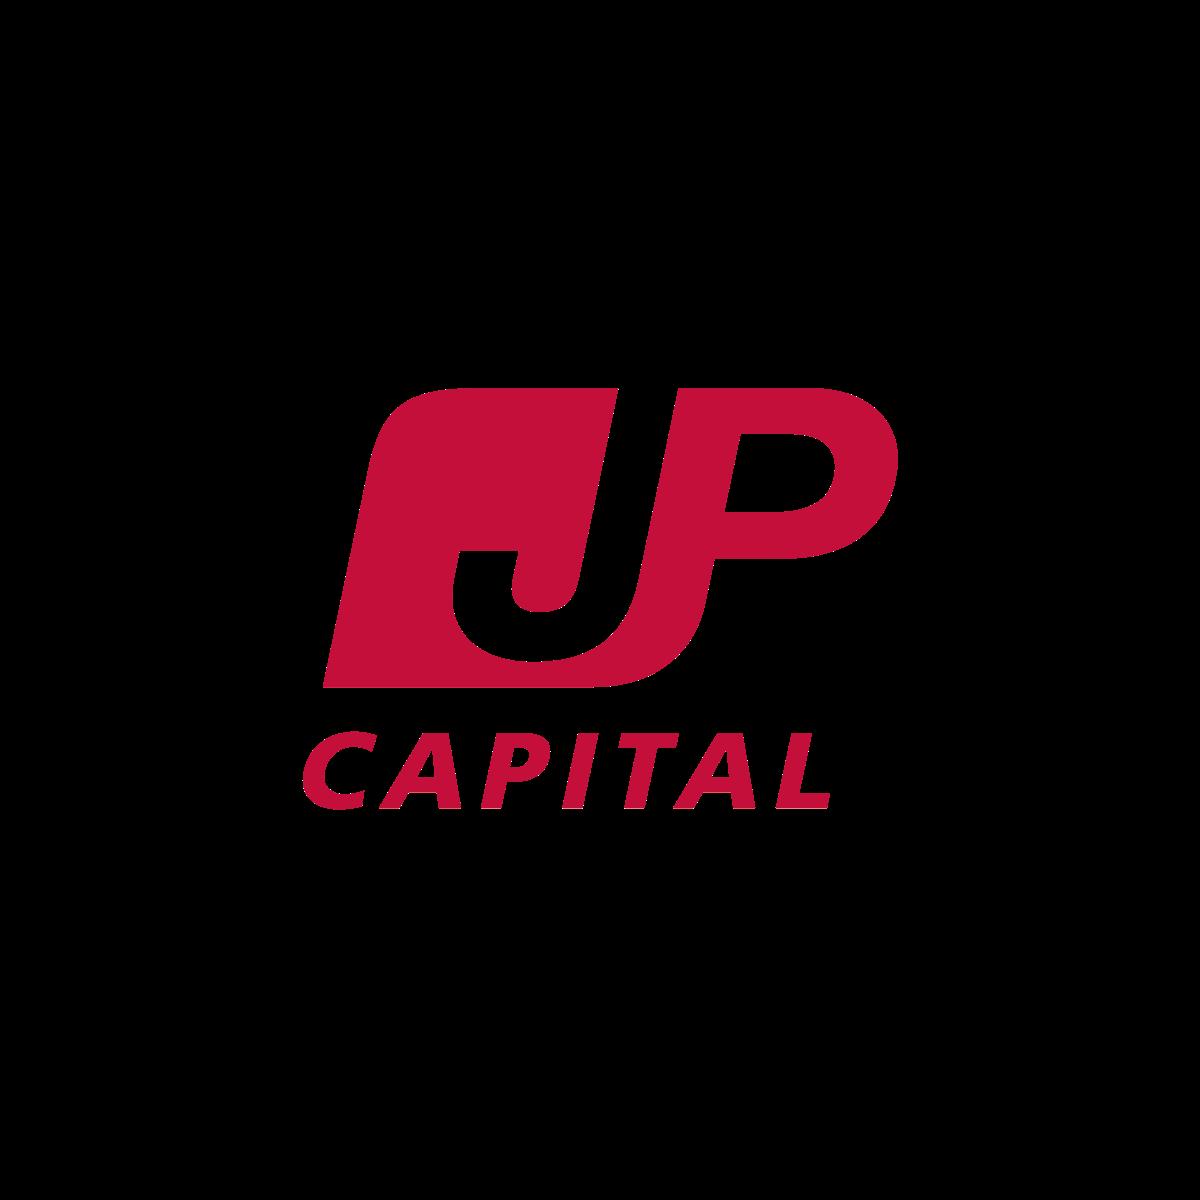 JpCapital